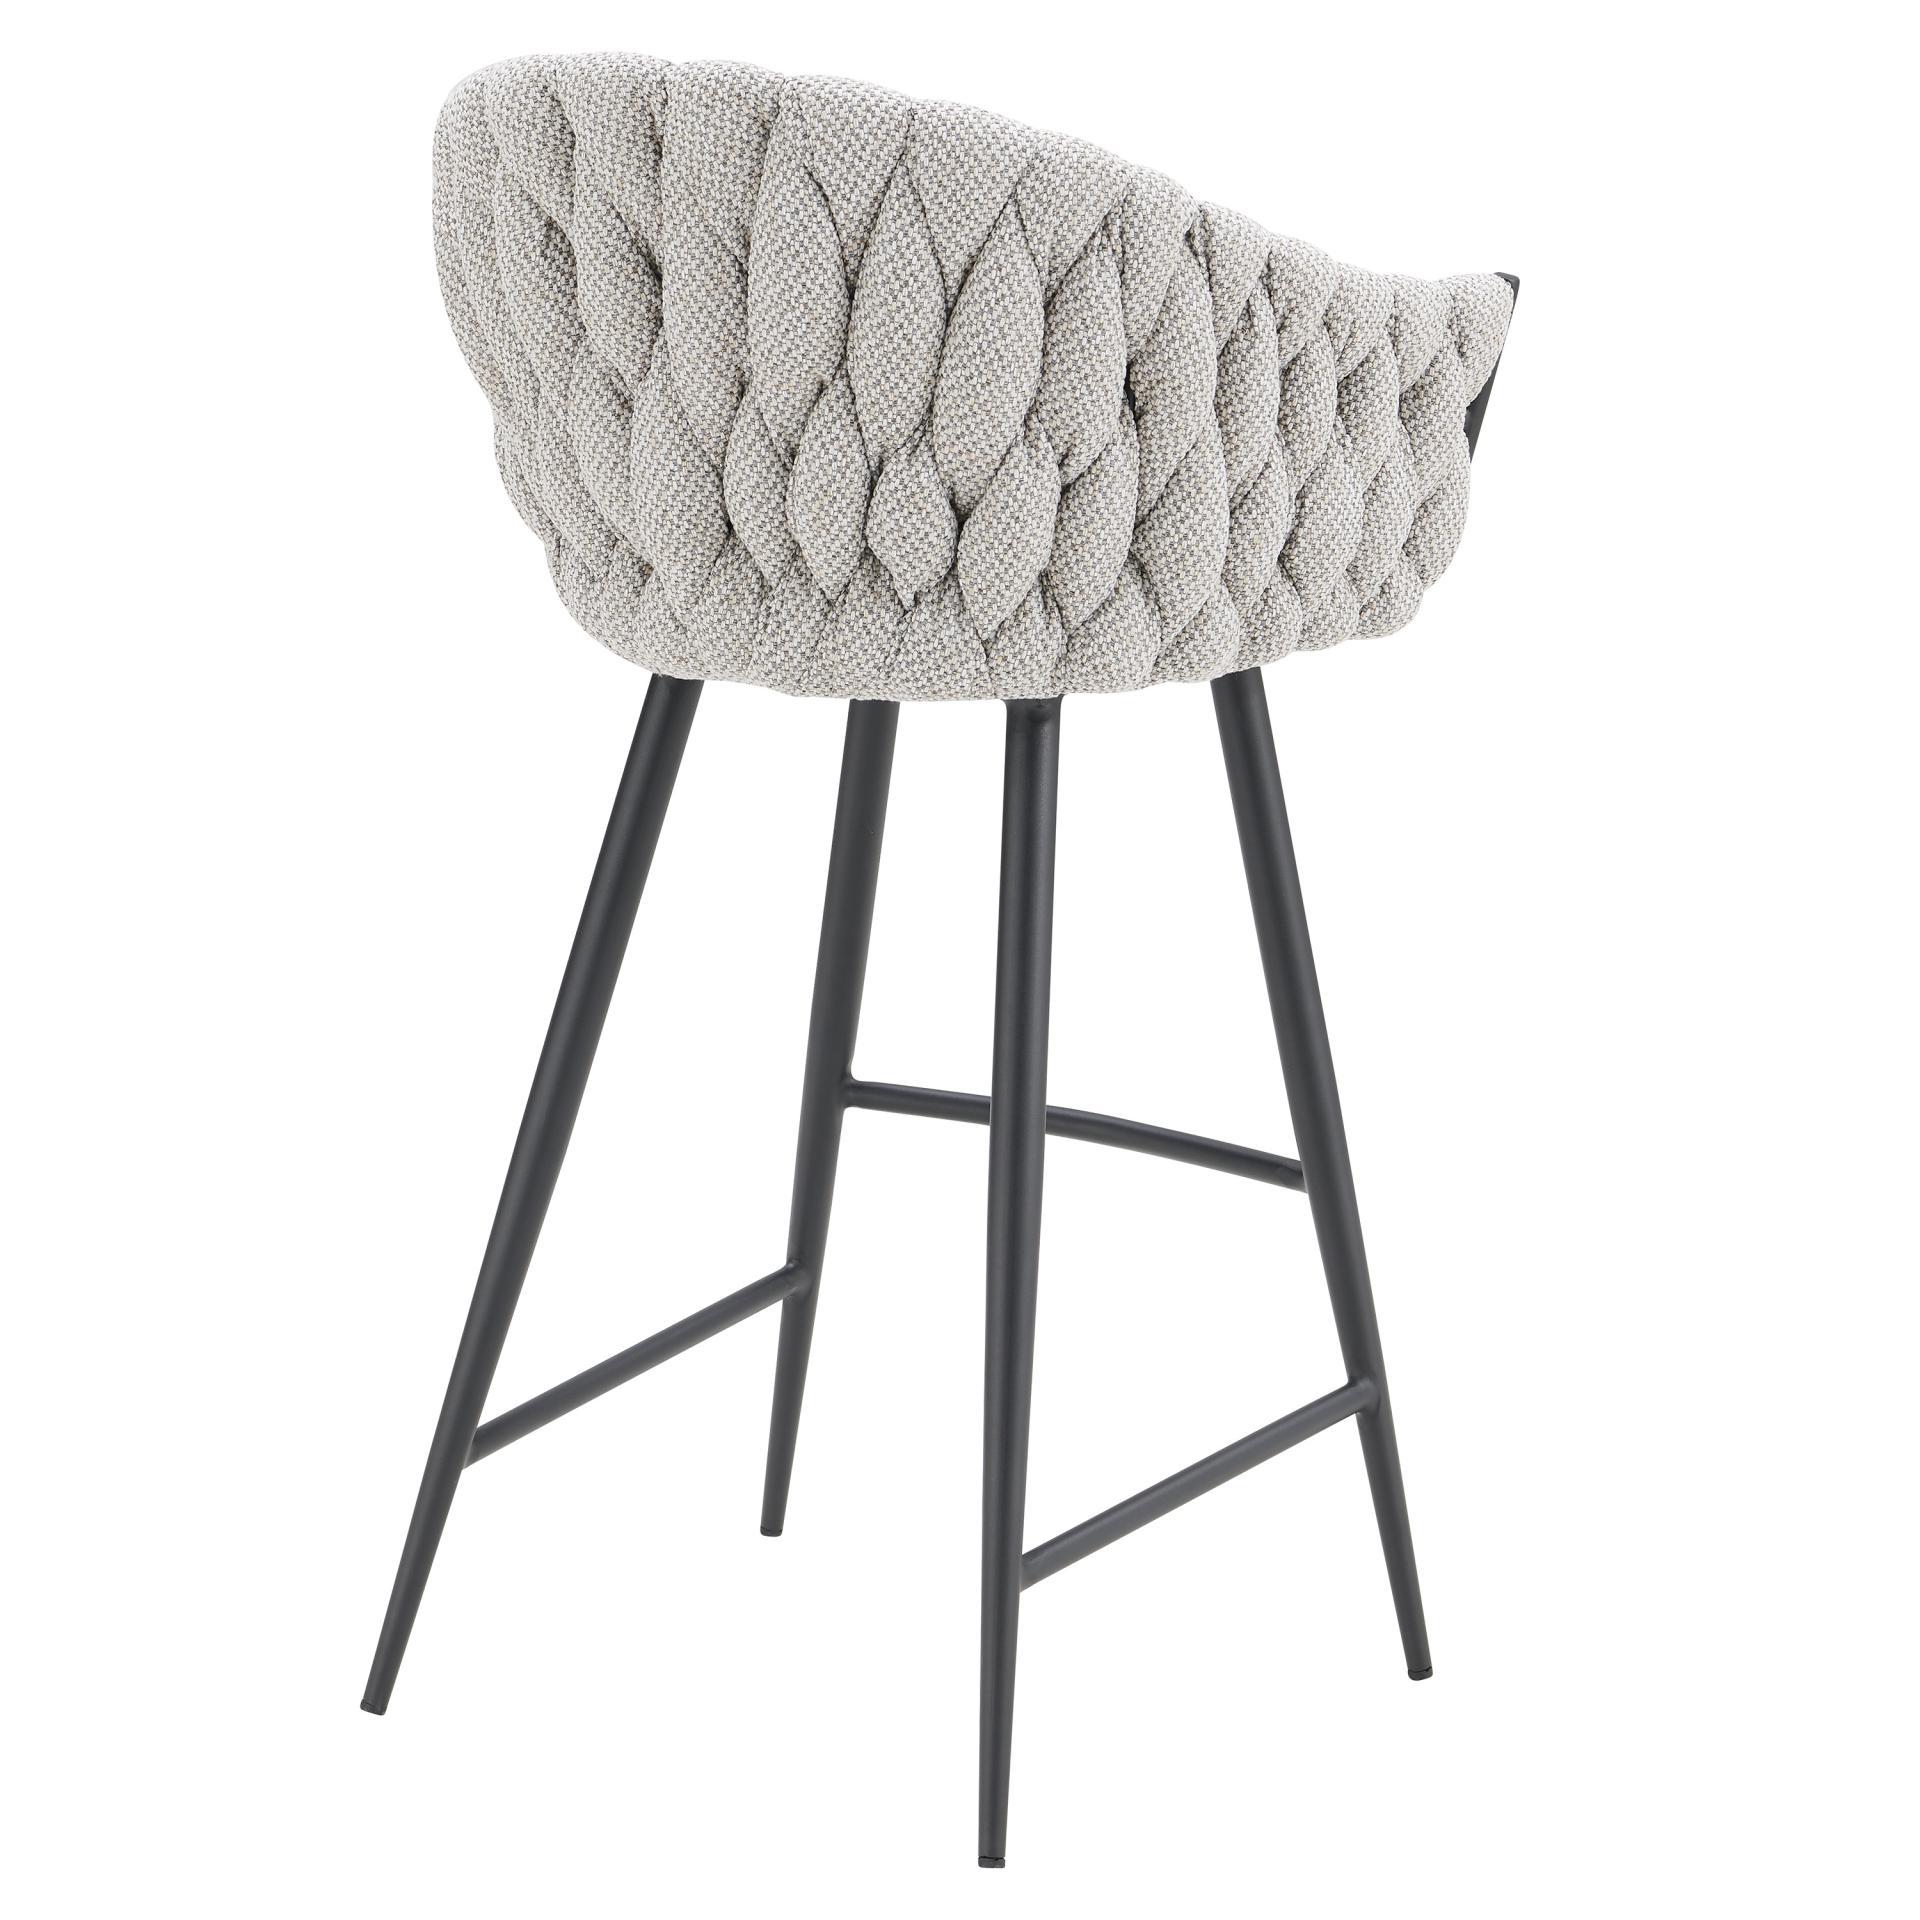 Direct Furniture Fairfax Va: 1240008-5006 - NPD Home Furniture